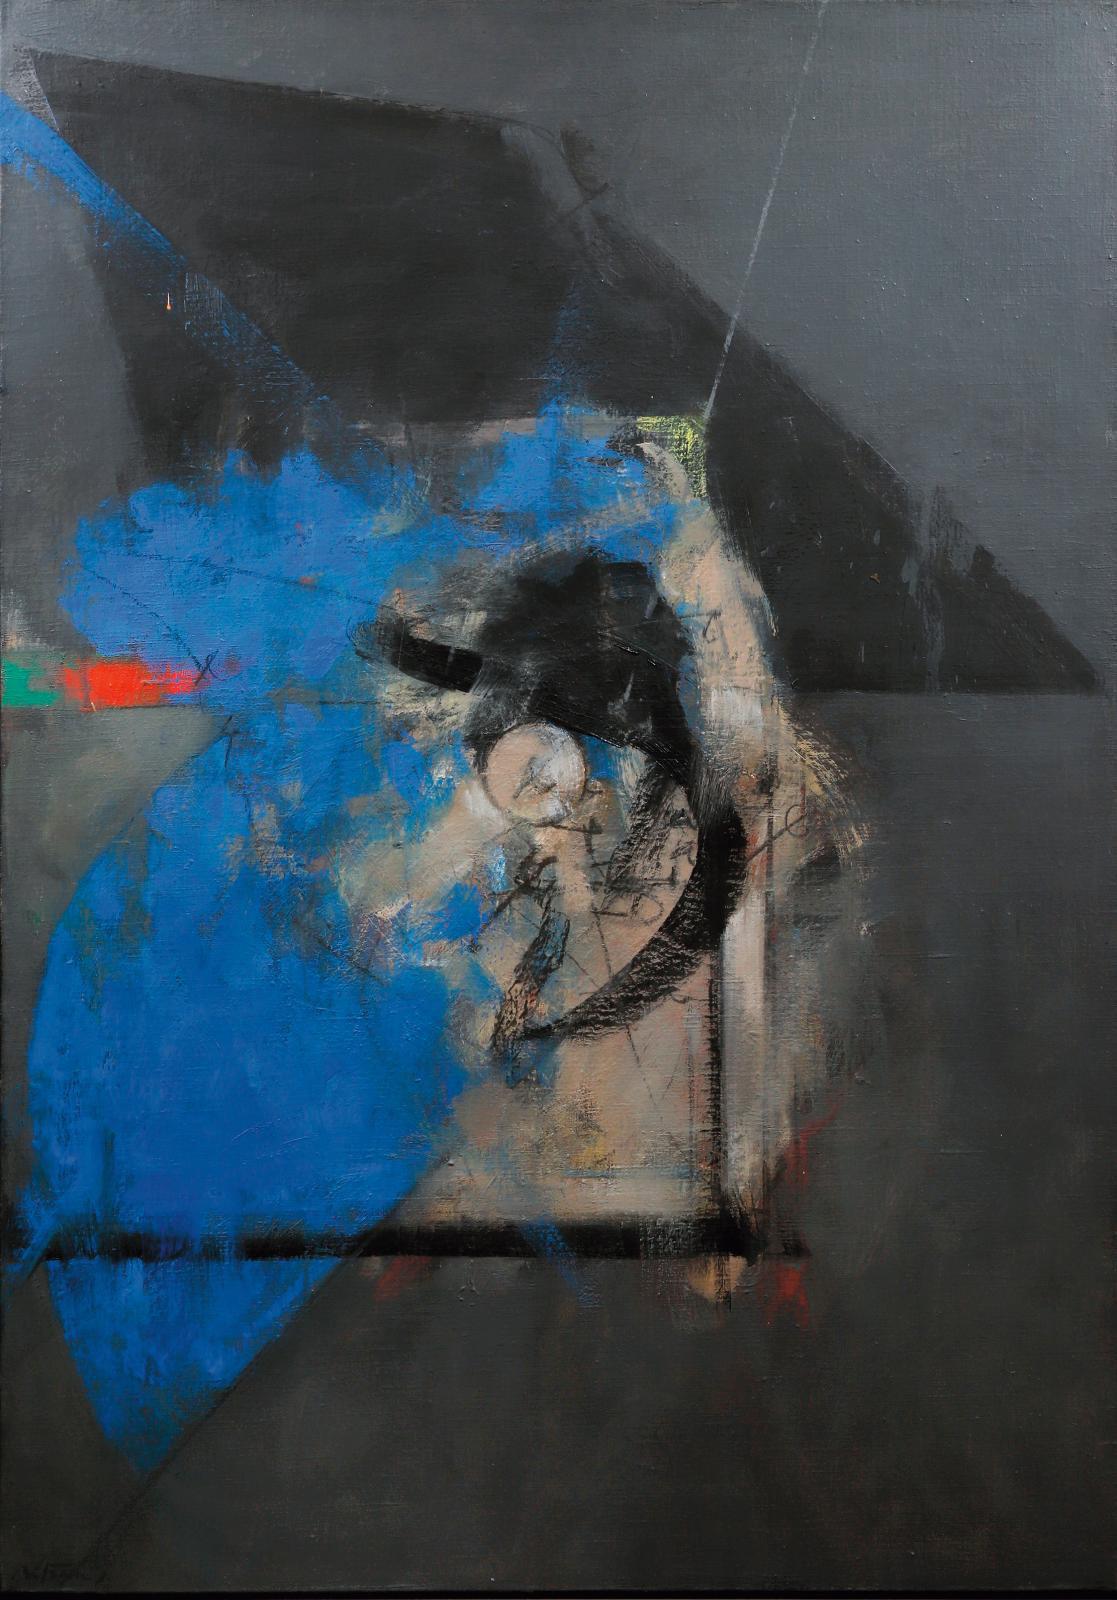 Albert Bitran (1929-2018), Dissonante verte (Green Dissonant), 1984-1986, oil on canvas, 92.5 x 65 cm/36.4 x 25.6 in.Paris, Drouot, April